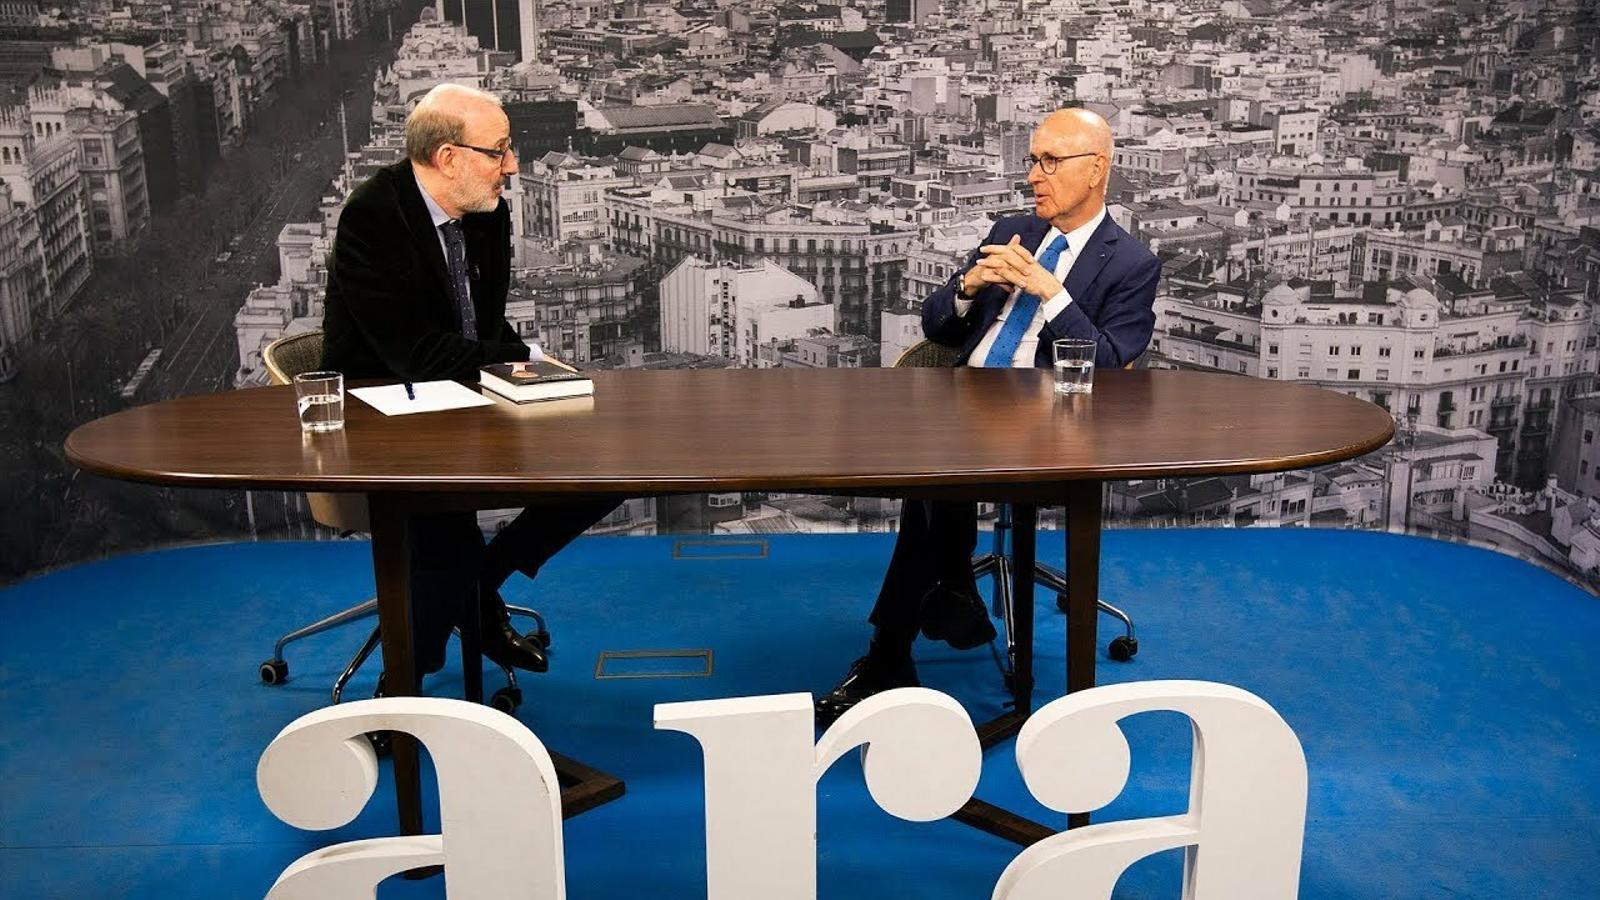 Antoni Bassas entrevista Josep Antoni Duran i Lleida